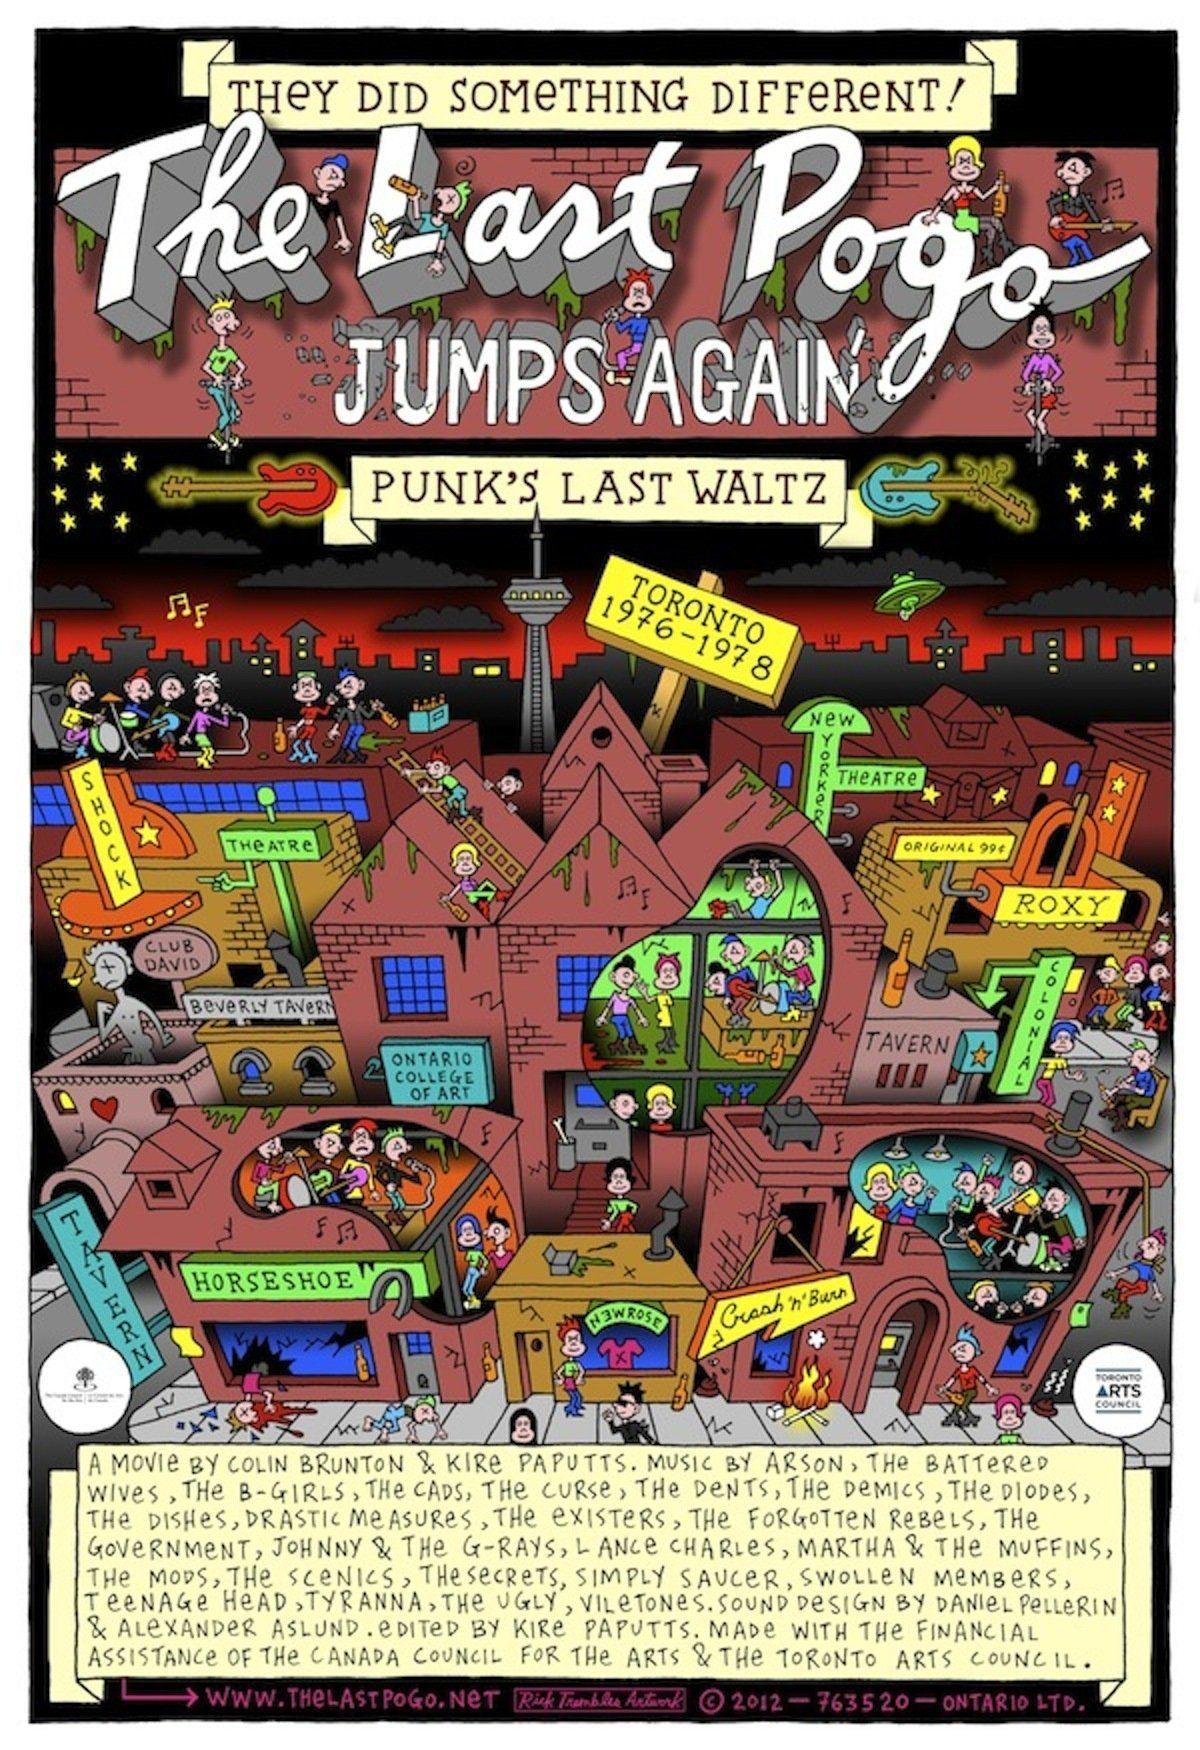 The Last Pogo Jumps Again - Documentaire (2013)